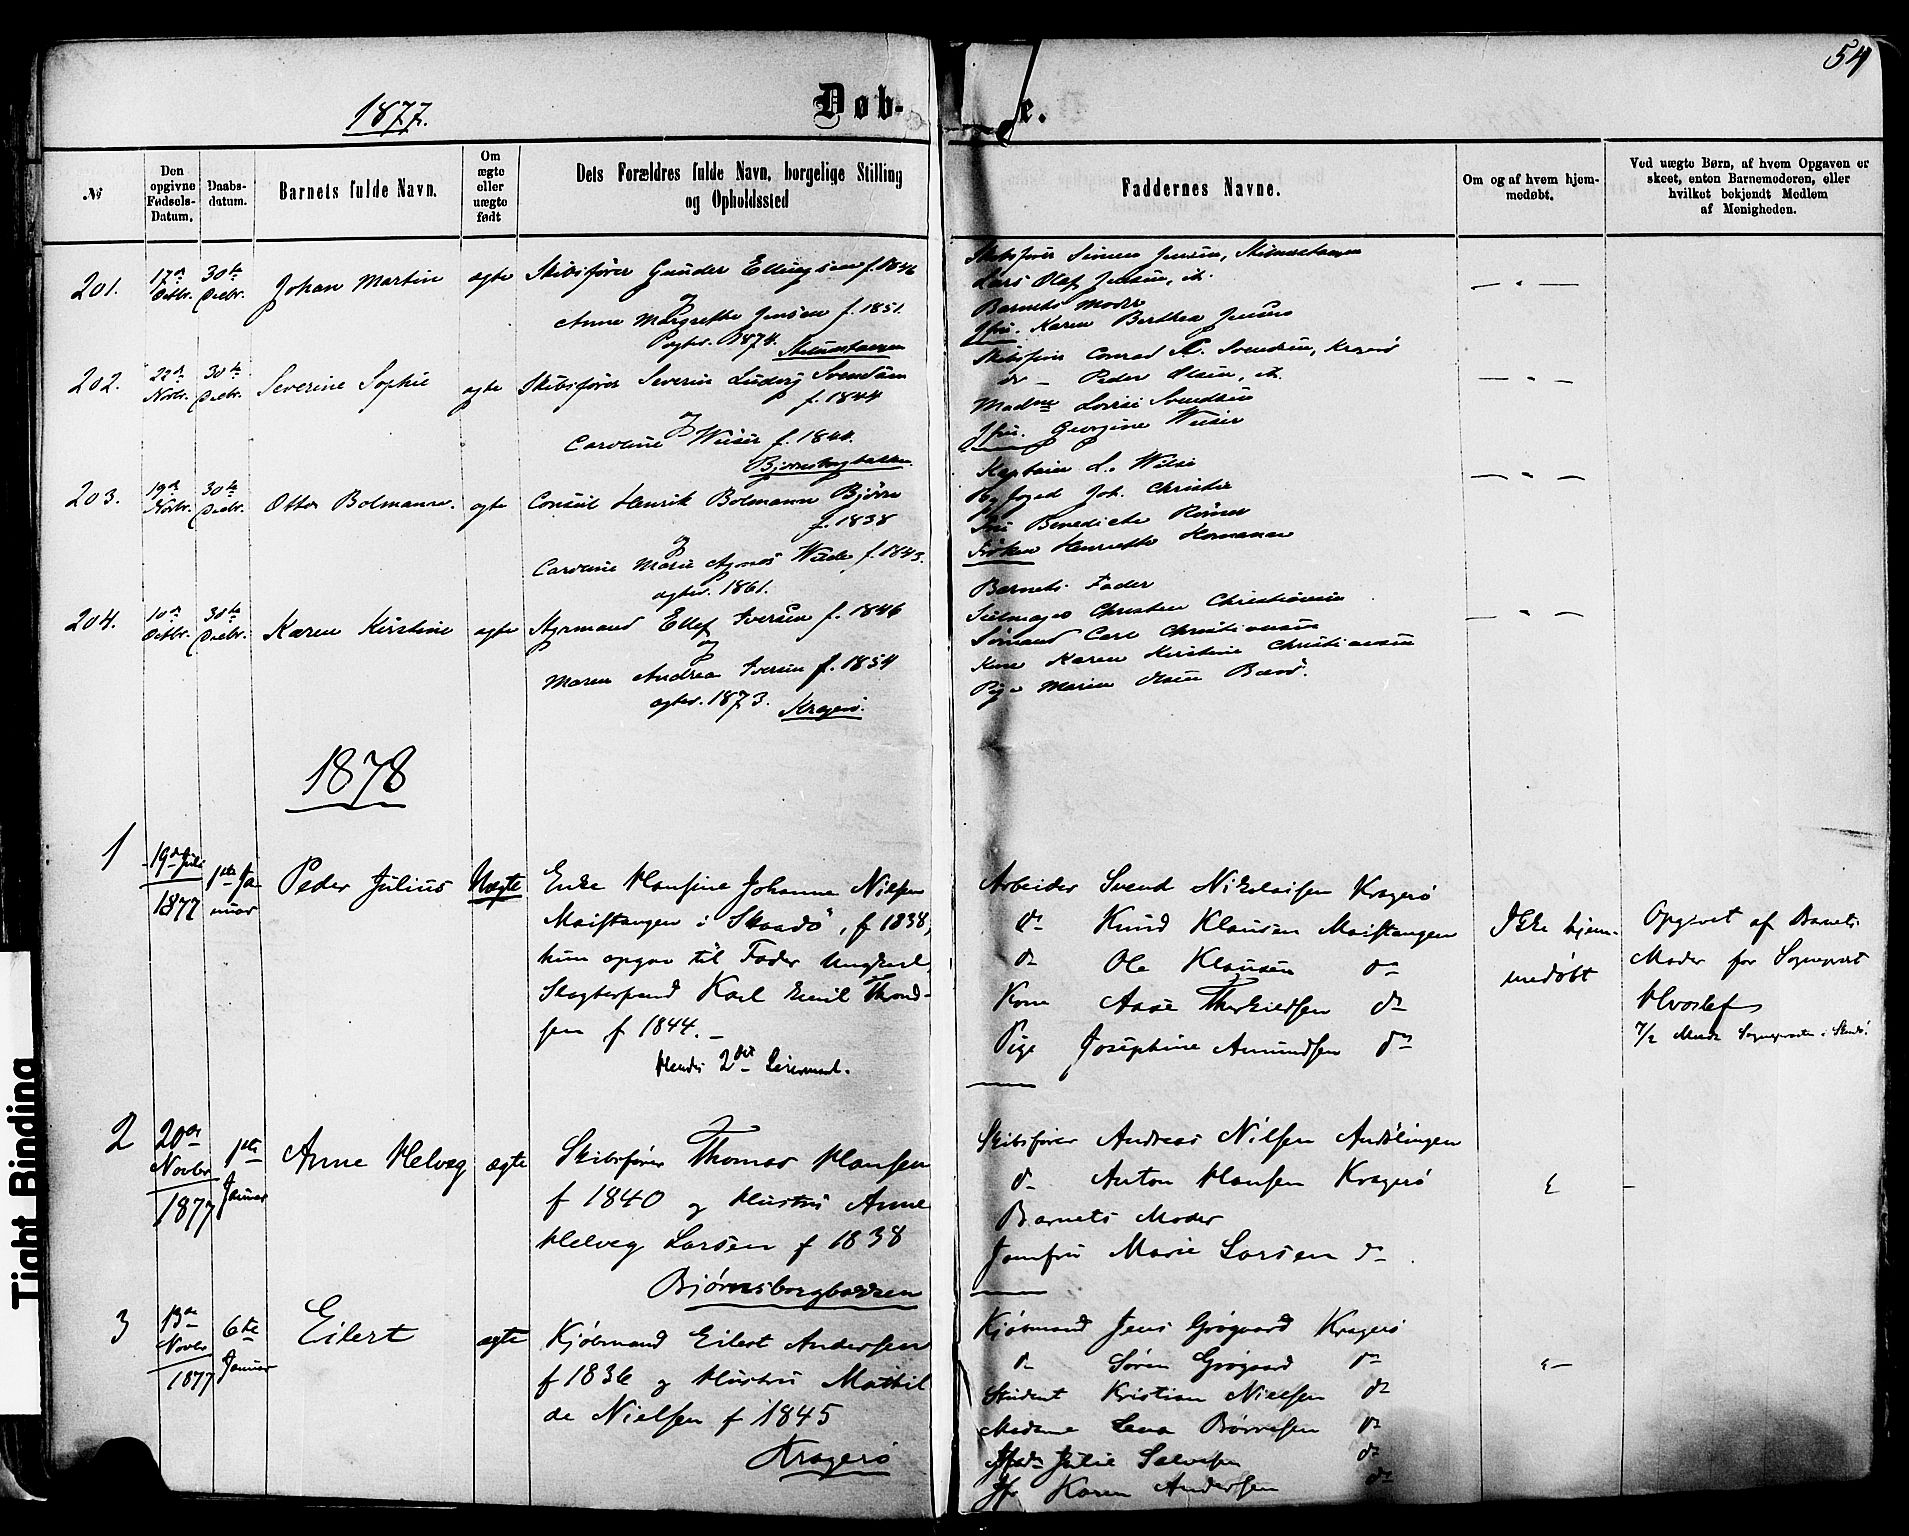 SAKO, Kragerø kirkebøker, F/Fa/L0011: Ministerialbok nr. 11, 1875-1886, s. 54